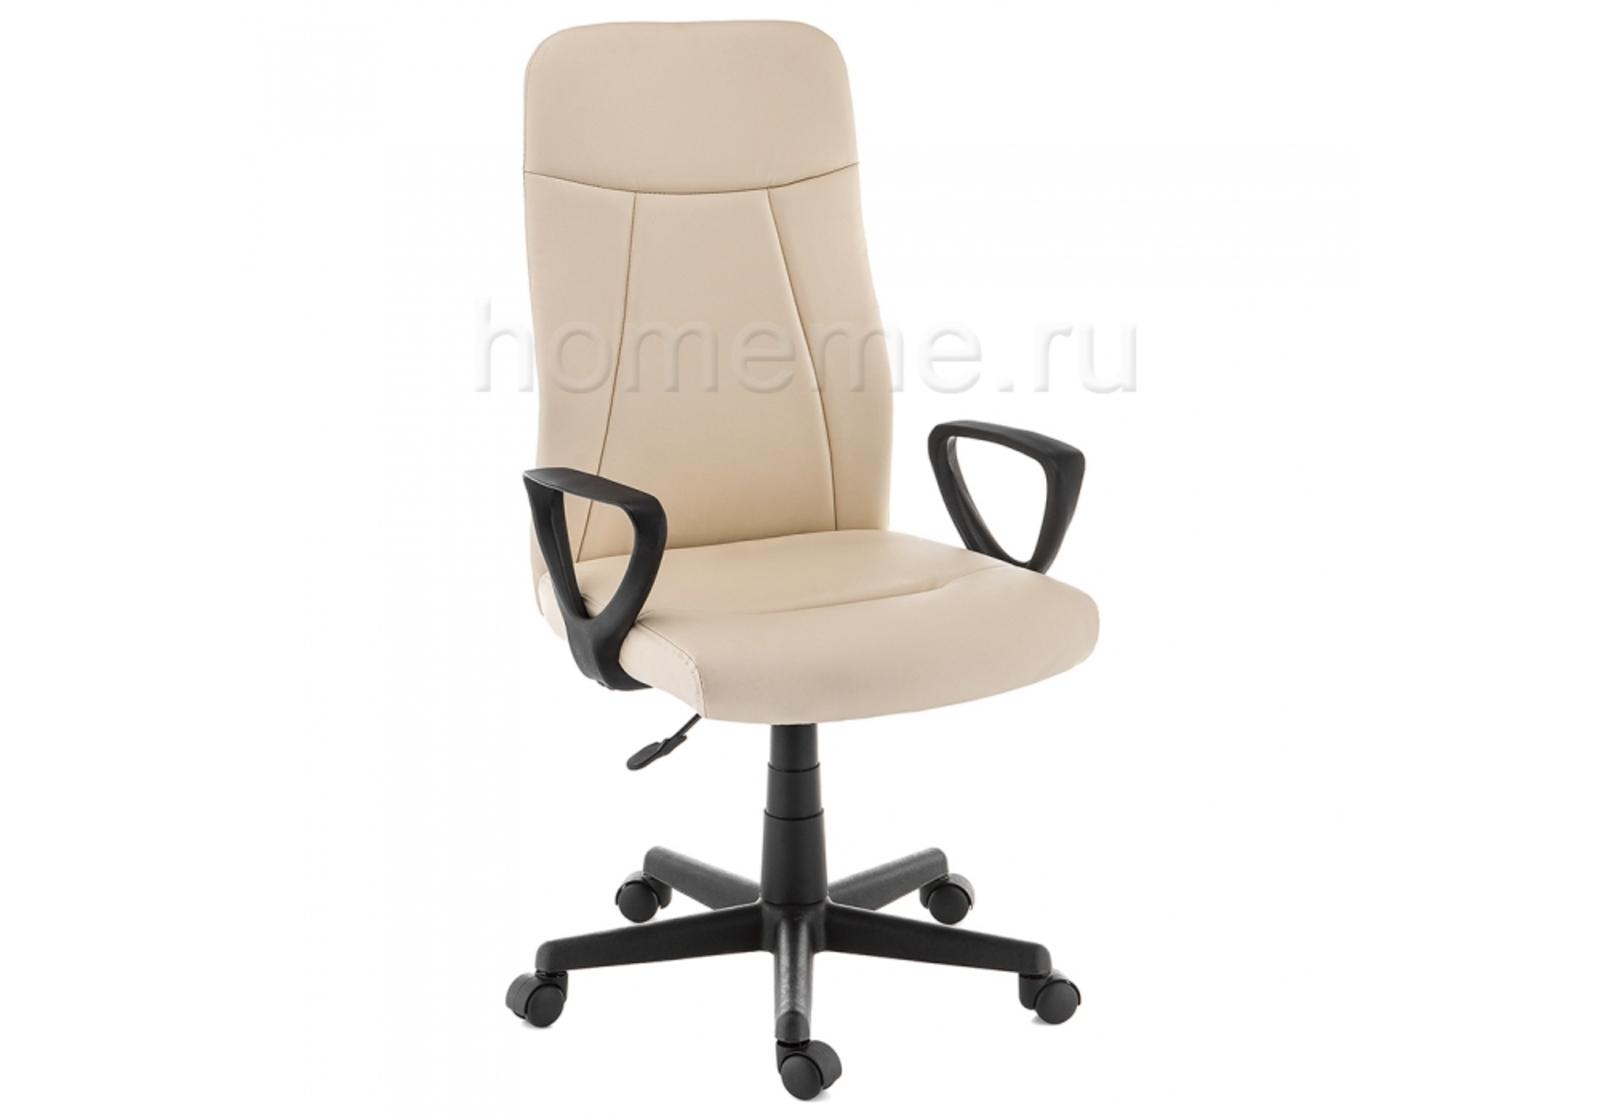 Кресло для офиса HomeMe Favor Ivory 11275 от Homeme.ru